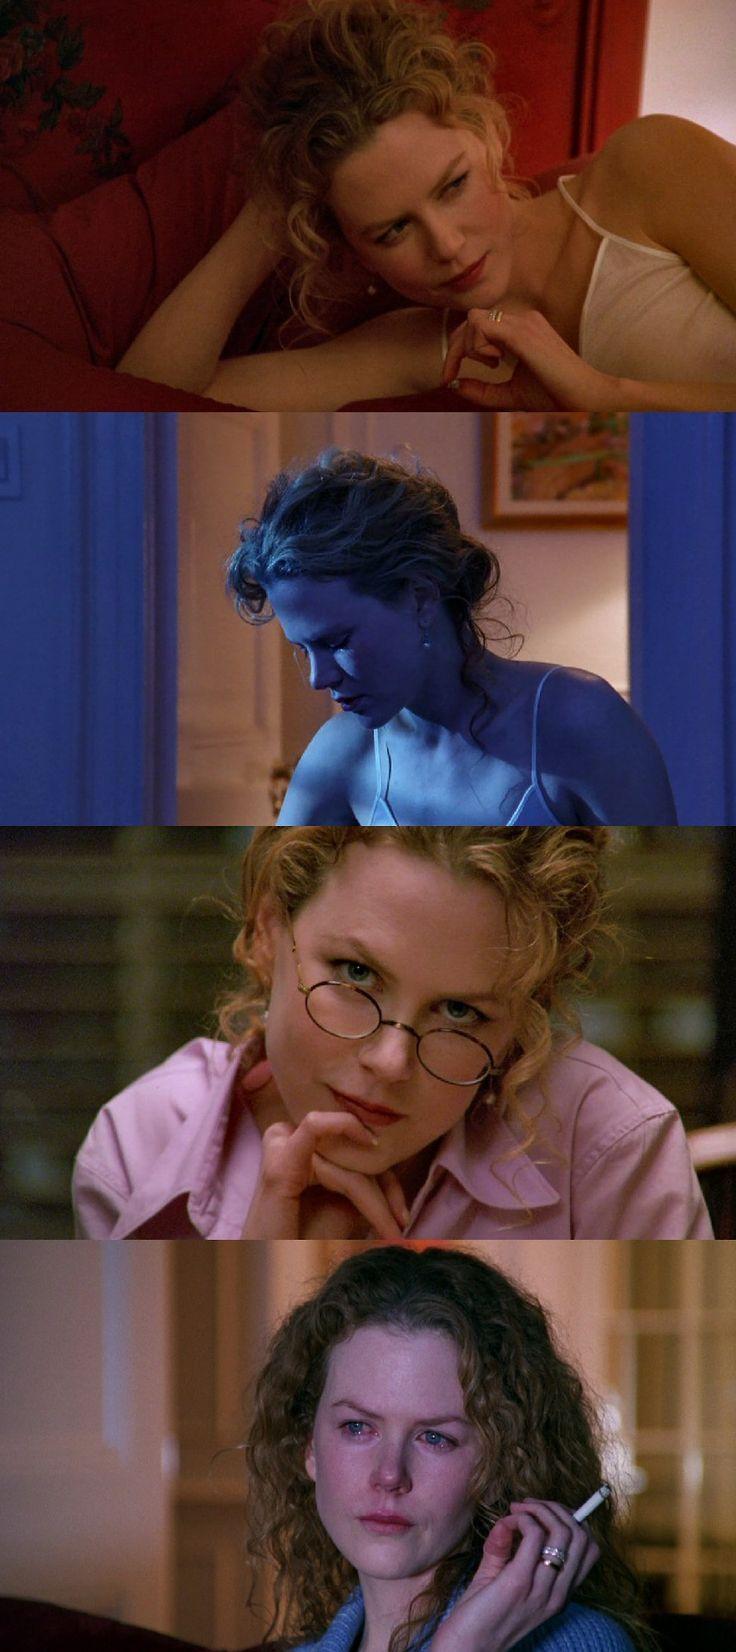 Nicole Kidman in Eyes Wide Shut, 1999 (dir. Stanley Kubrick)